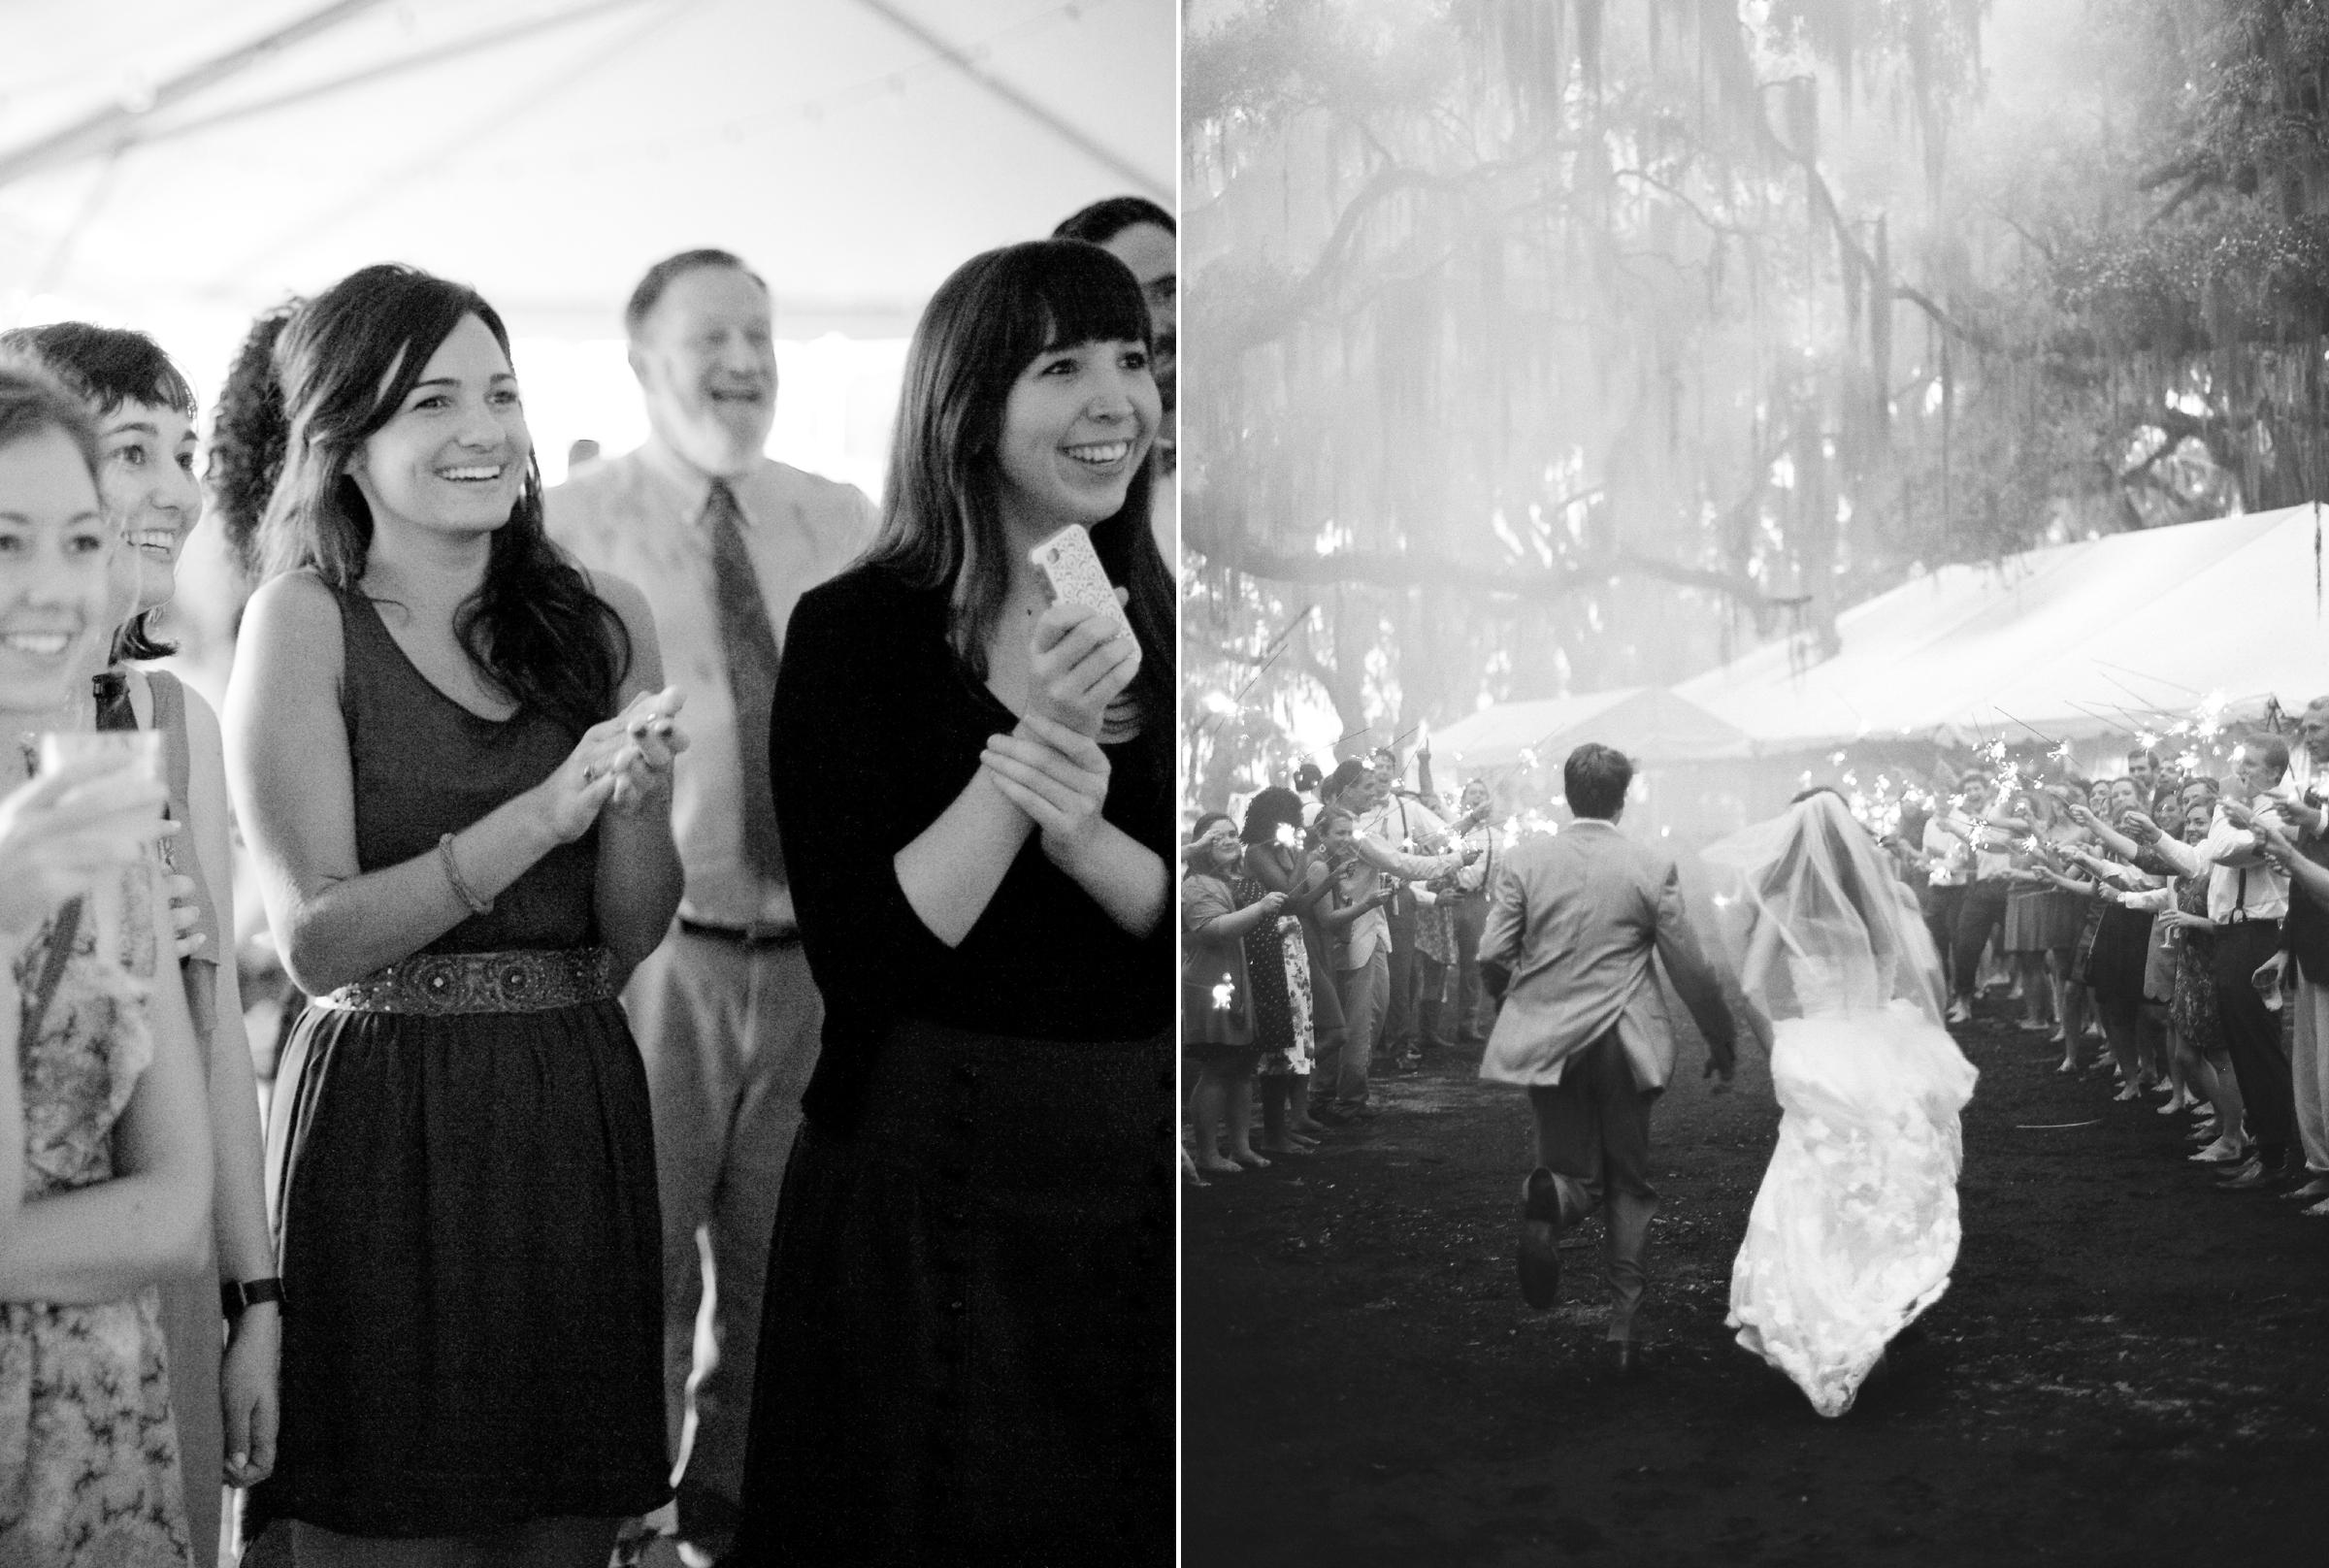 st_simons_island_wedding_photographer_shannon_griffin_0037.jpg